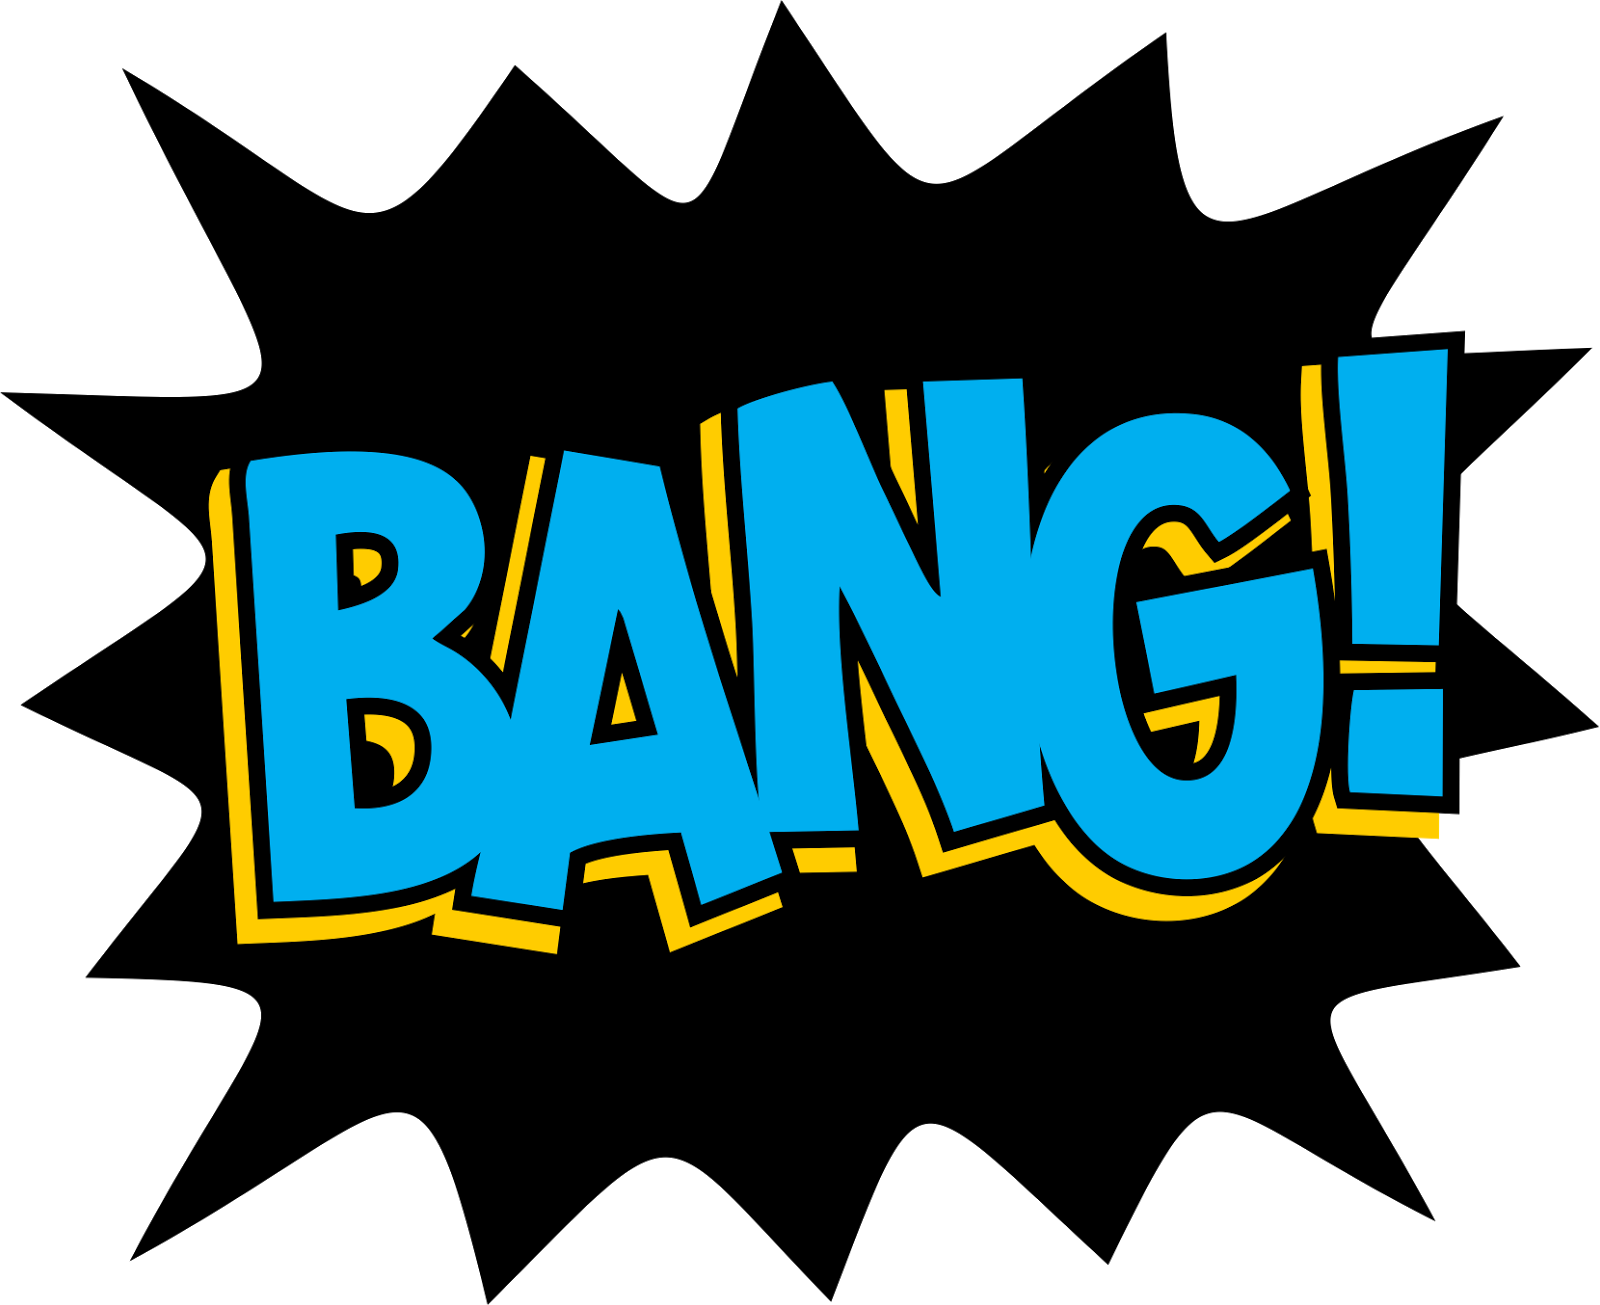 Batman throwing star clipart picture freeuse stock Batman Cute Clip Art. | Hero | Pinterest | Batman, Fiestas and ... picture freeuse stock